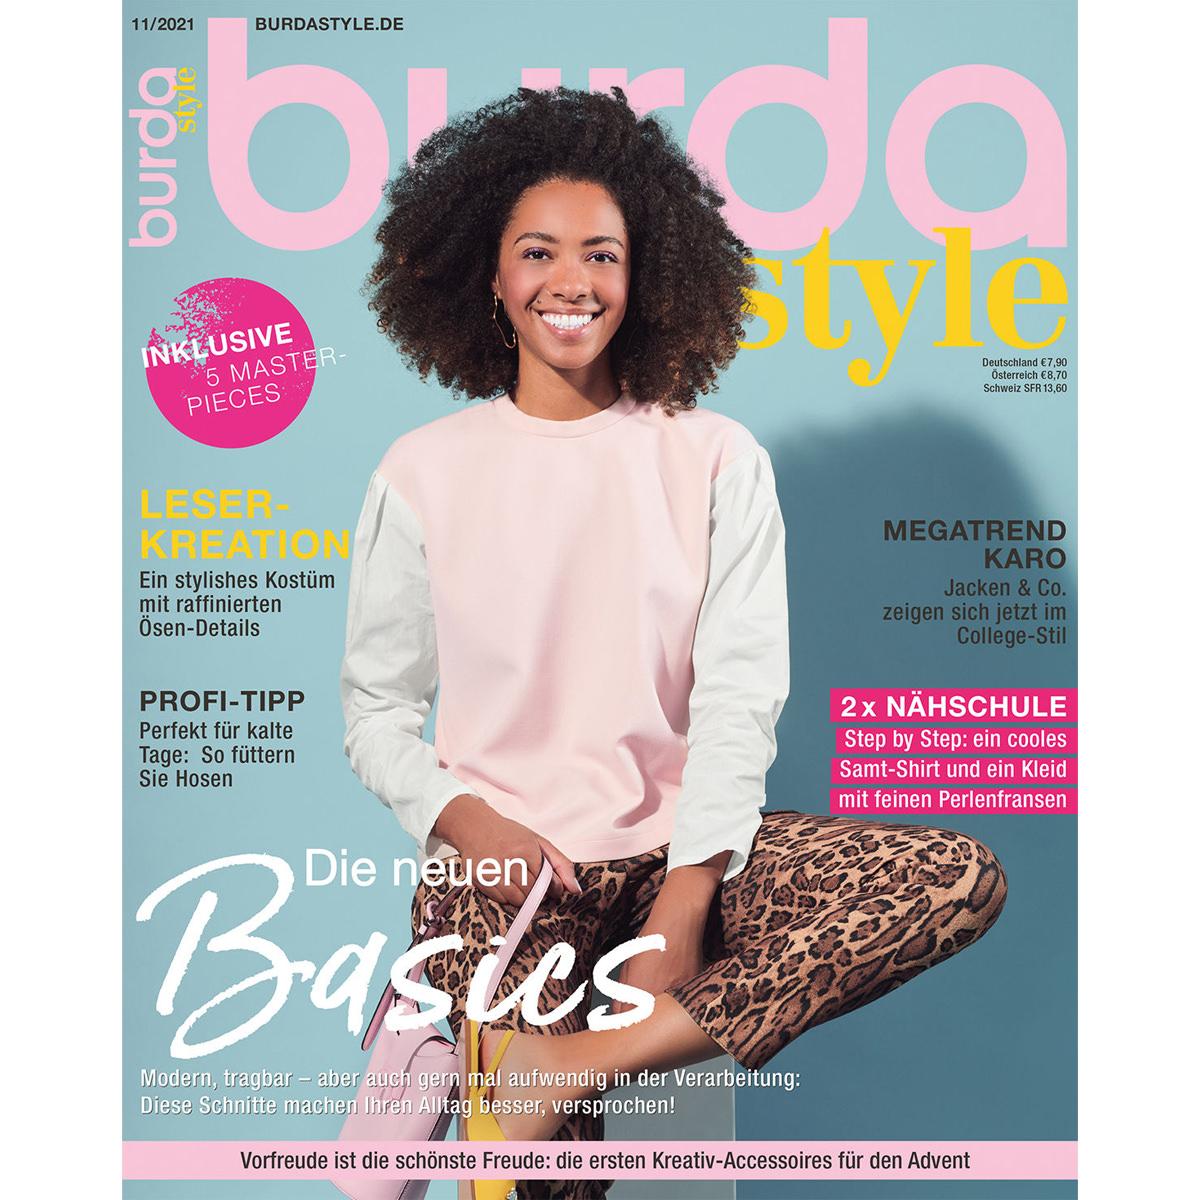 burda style Ausgabe November 2021